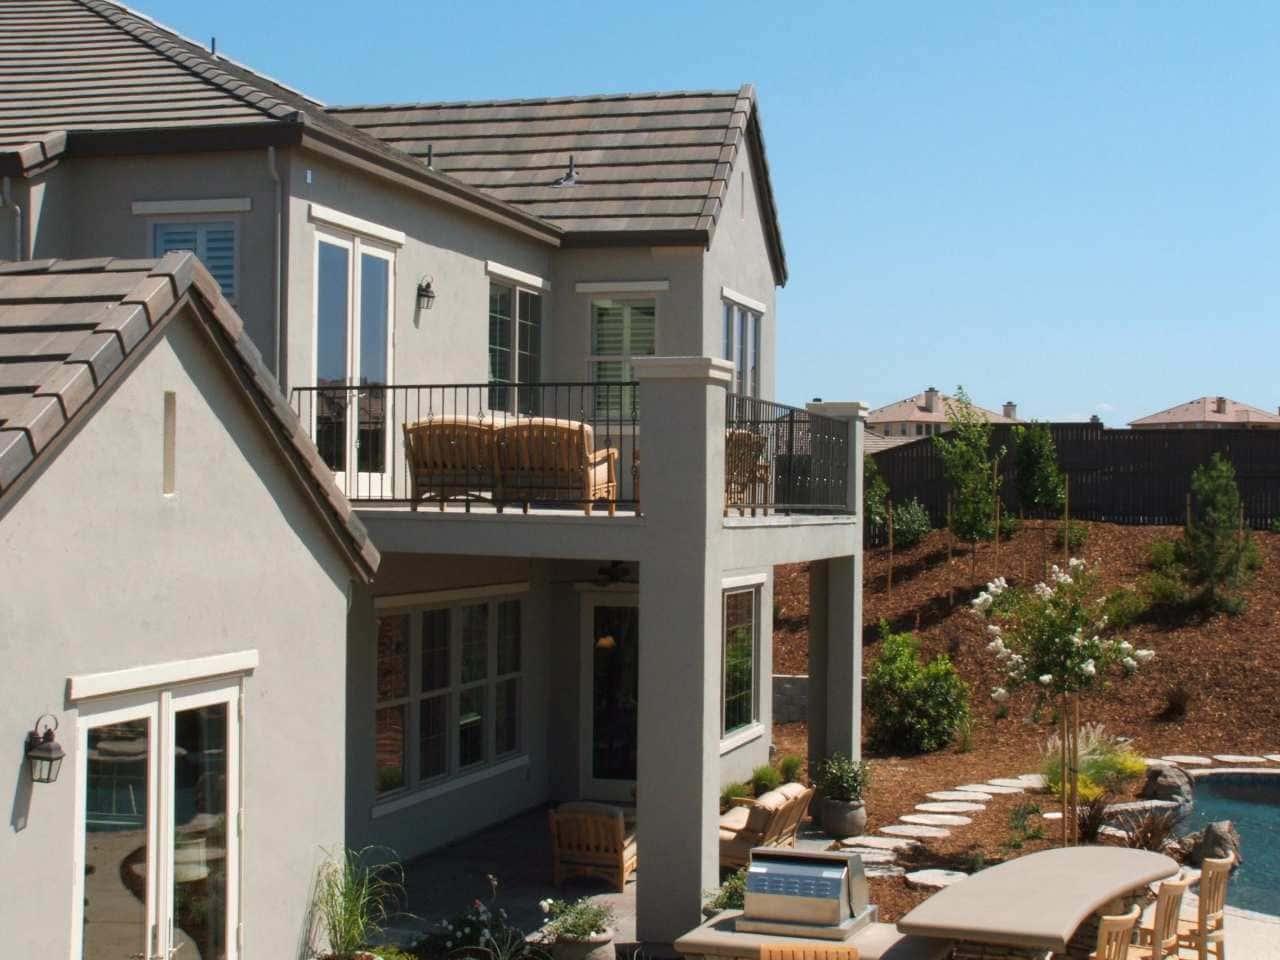 Backyard of a nice house